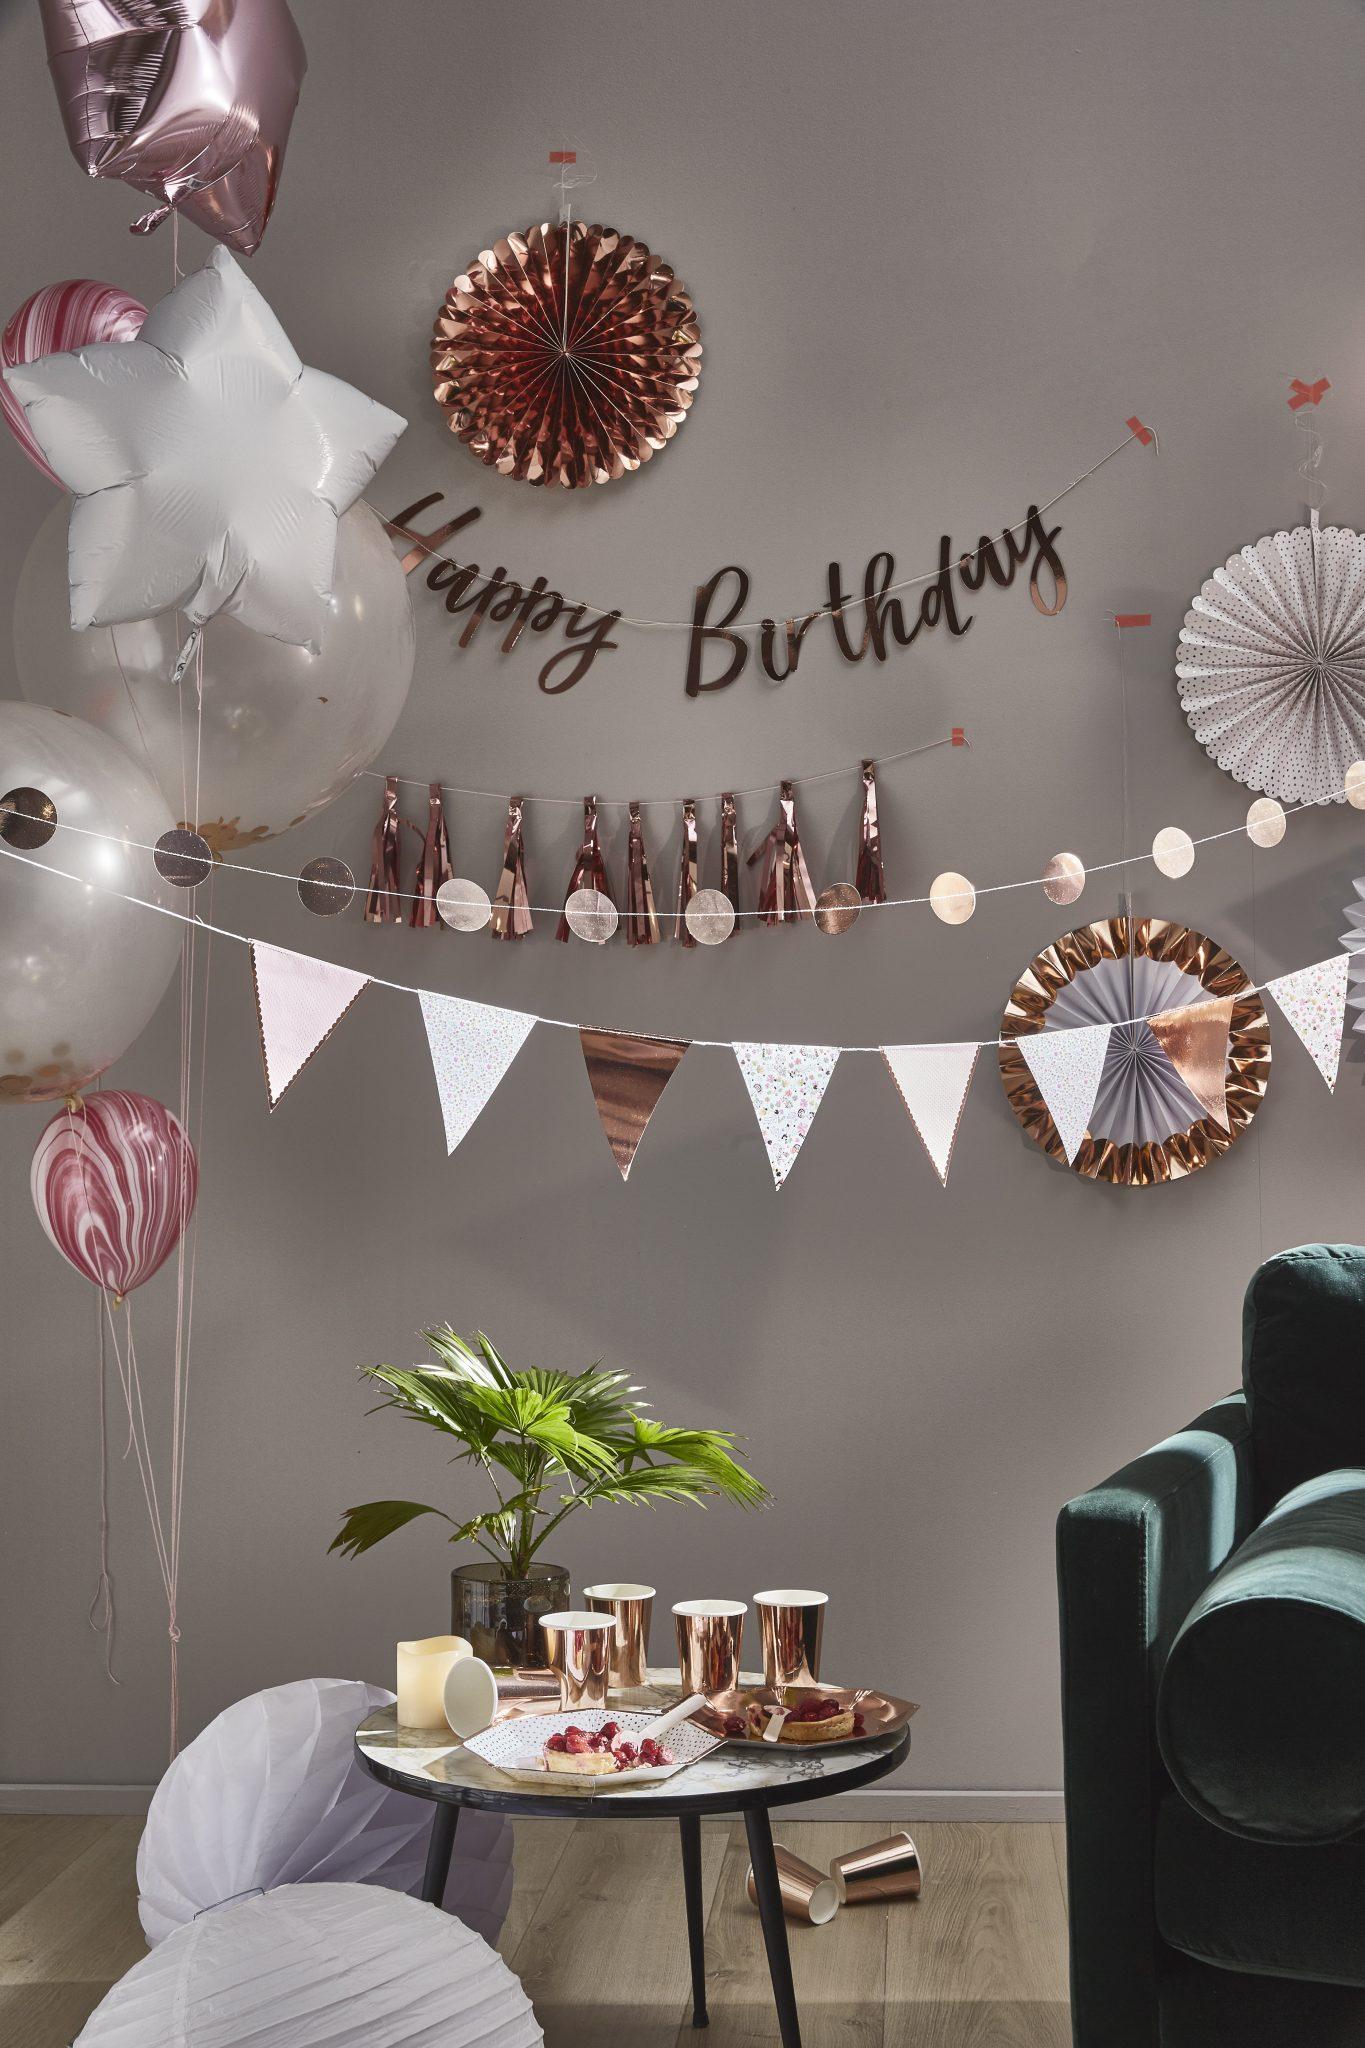 décoration anniversaire rose gold or party guirlandes happy birthday skylantern